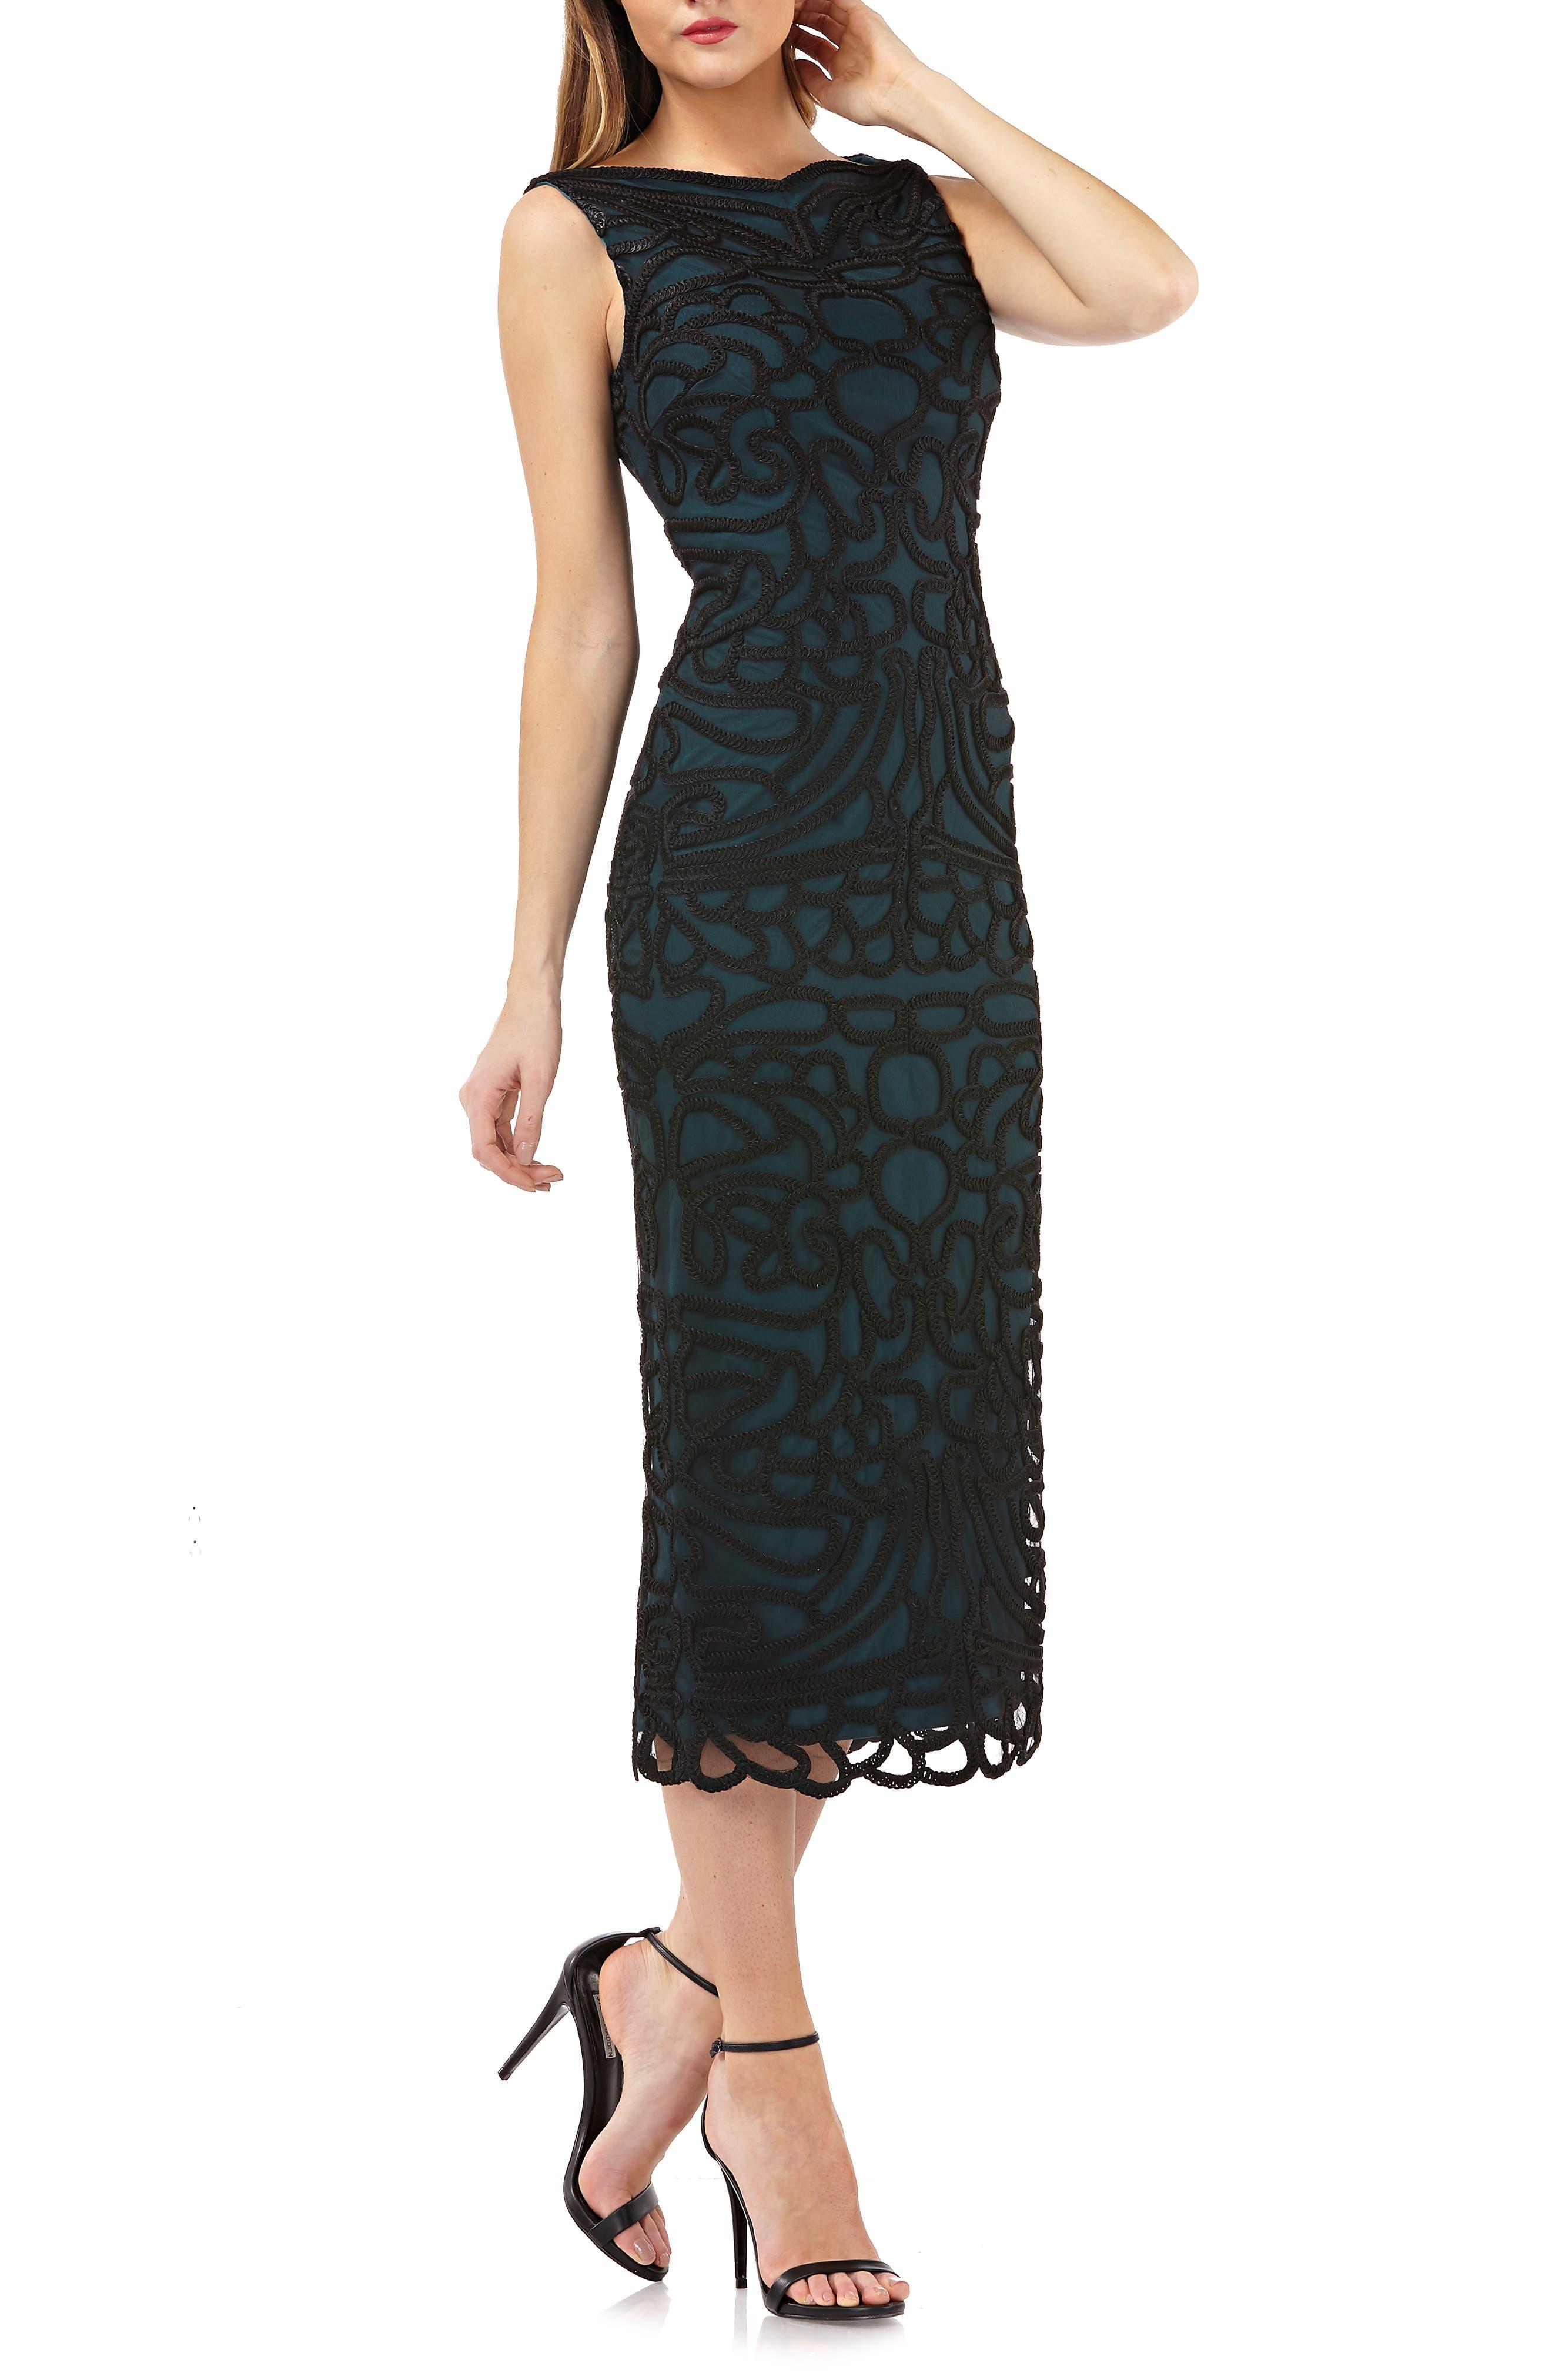 Js Collections Soutache Embroidered Midi Dress, Black